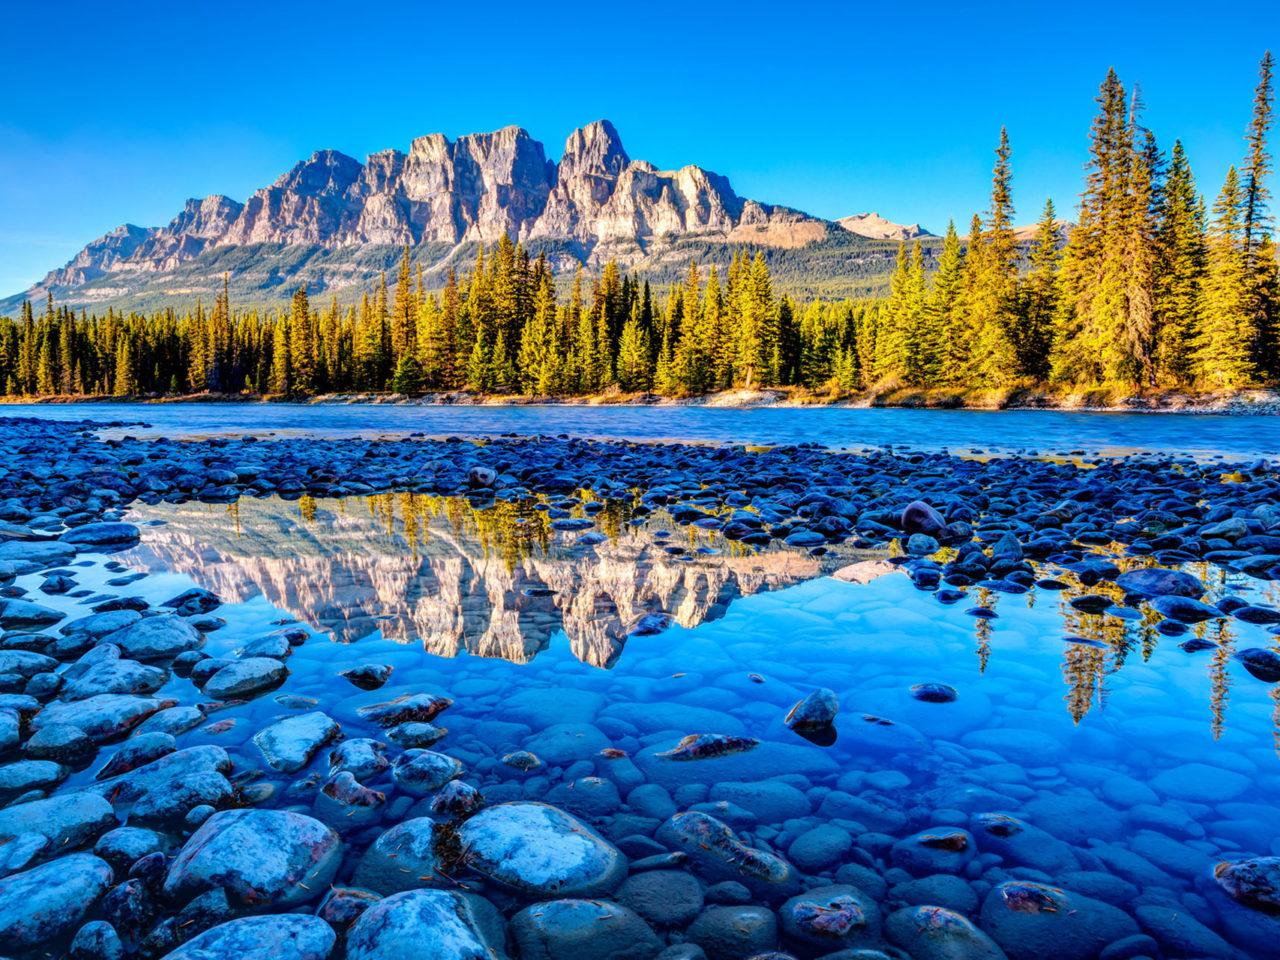 Disney Iphone Wallpaper Canada S Banff National Park Alberta Beautiful Mountain